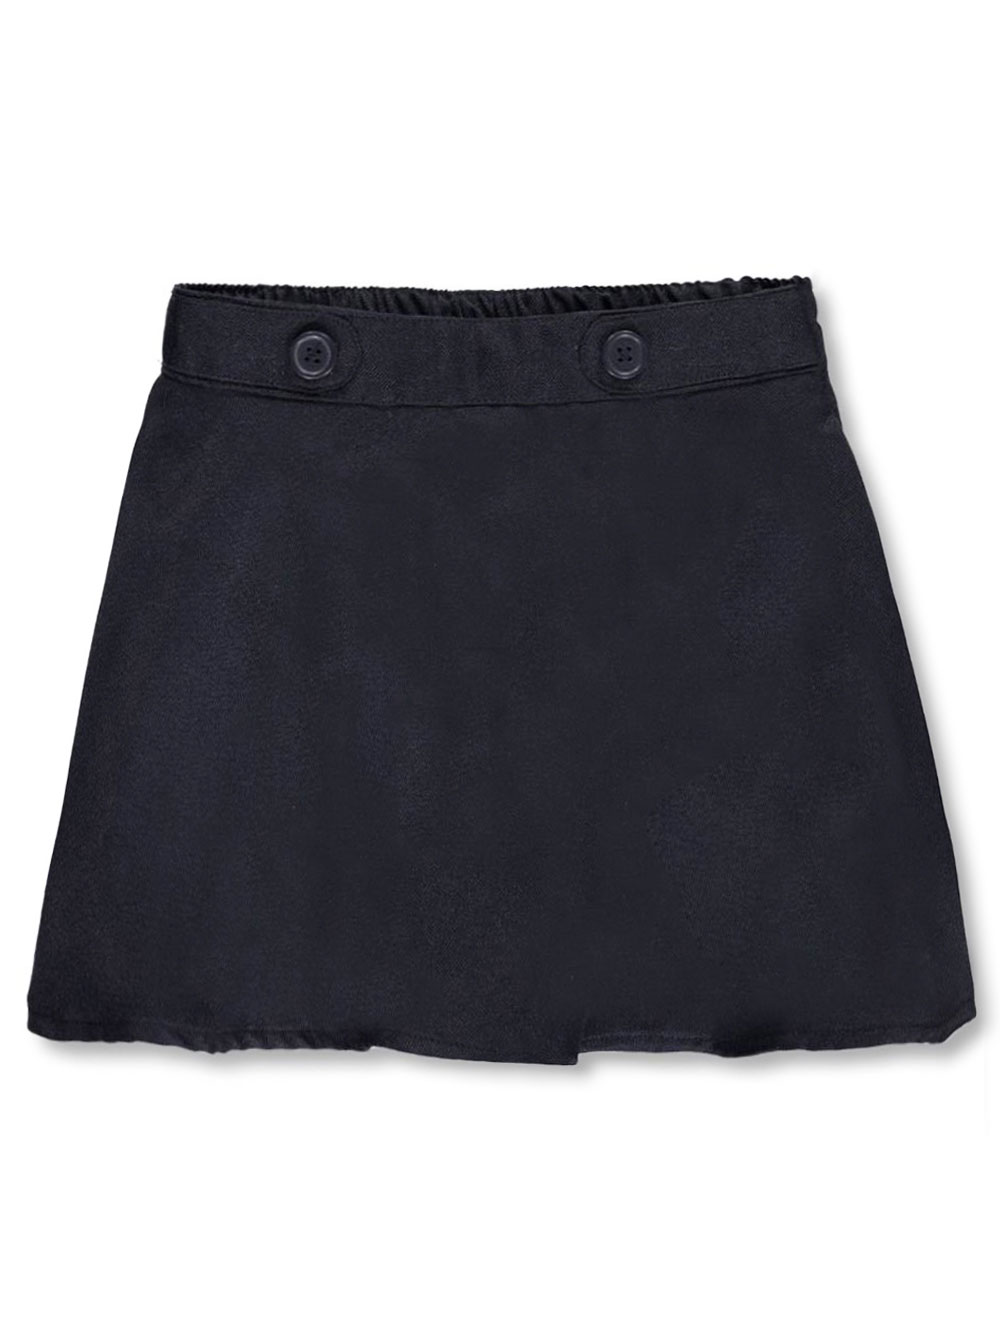 Image of Nautica Little Girls Button Tab Waist Scooter Skirt Sizes 4  6X